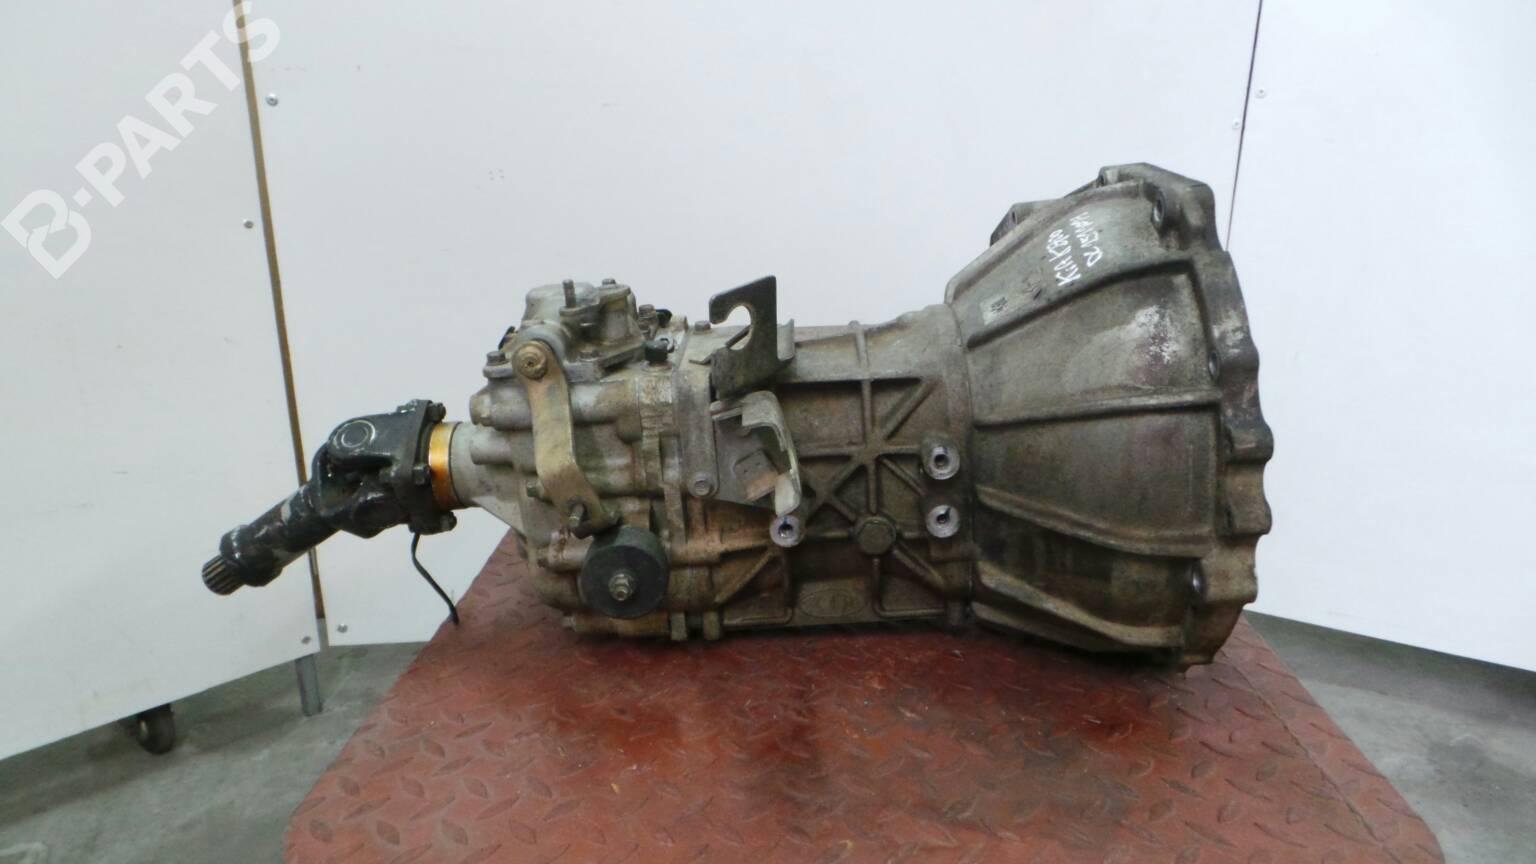 hight resolution of manual gearbox kia k2700 sd 2 7 d 60601manual gearbox y000805740 kia k2700